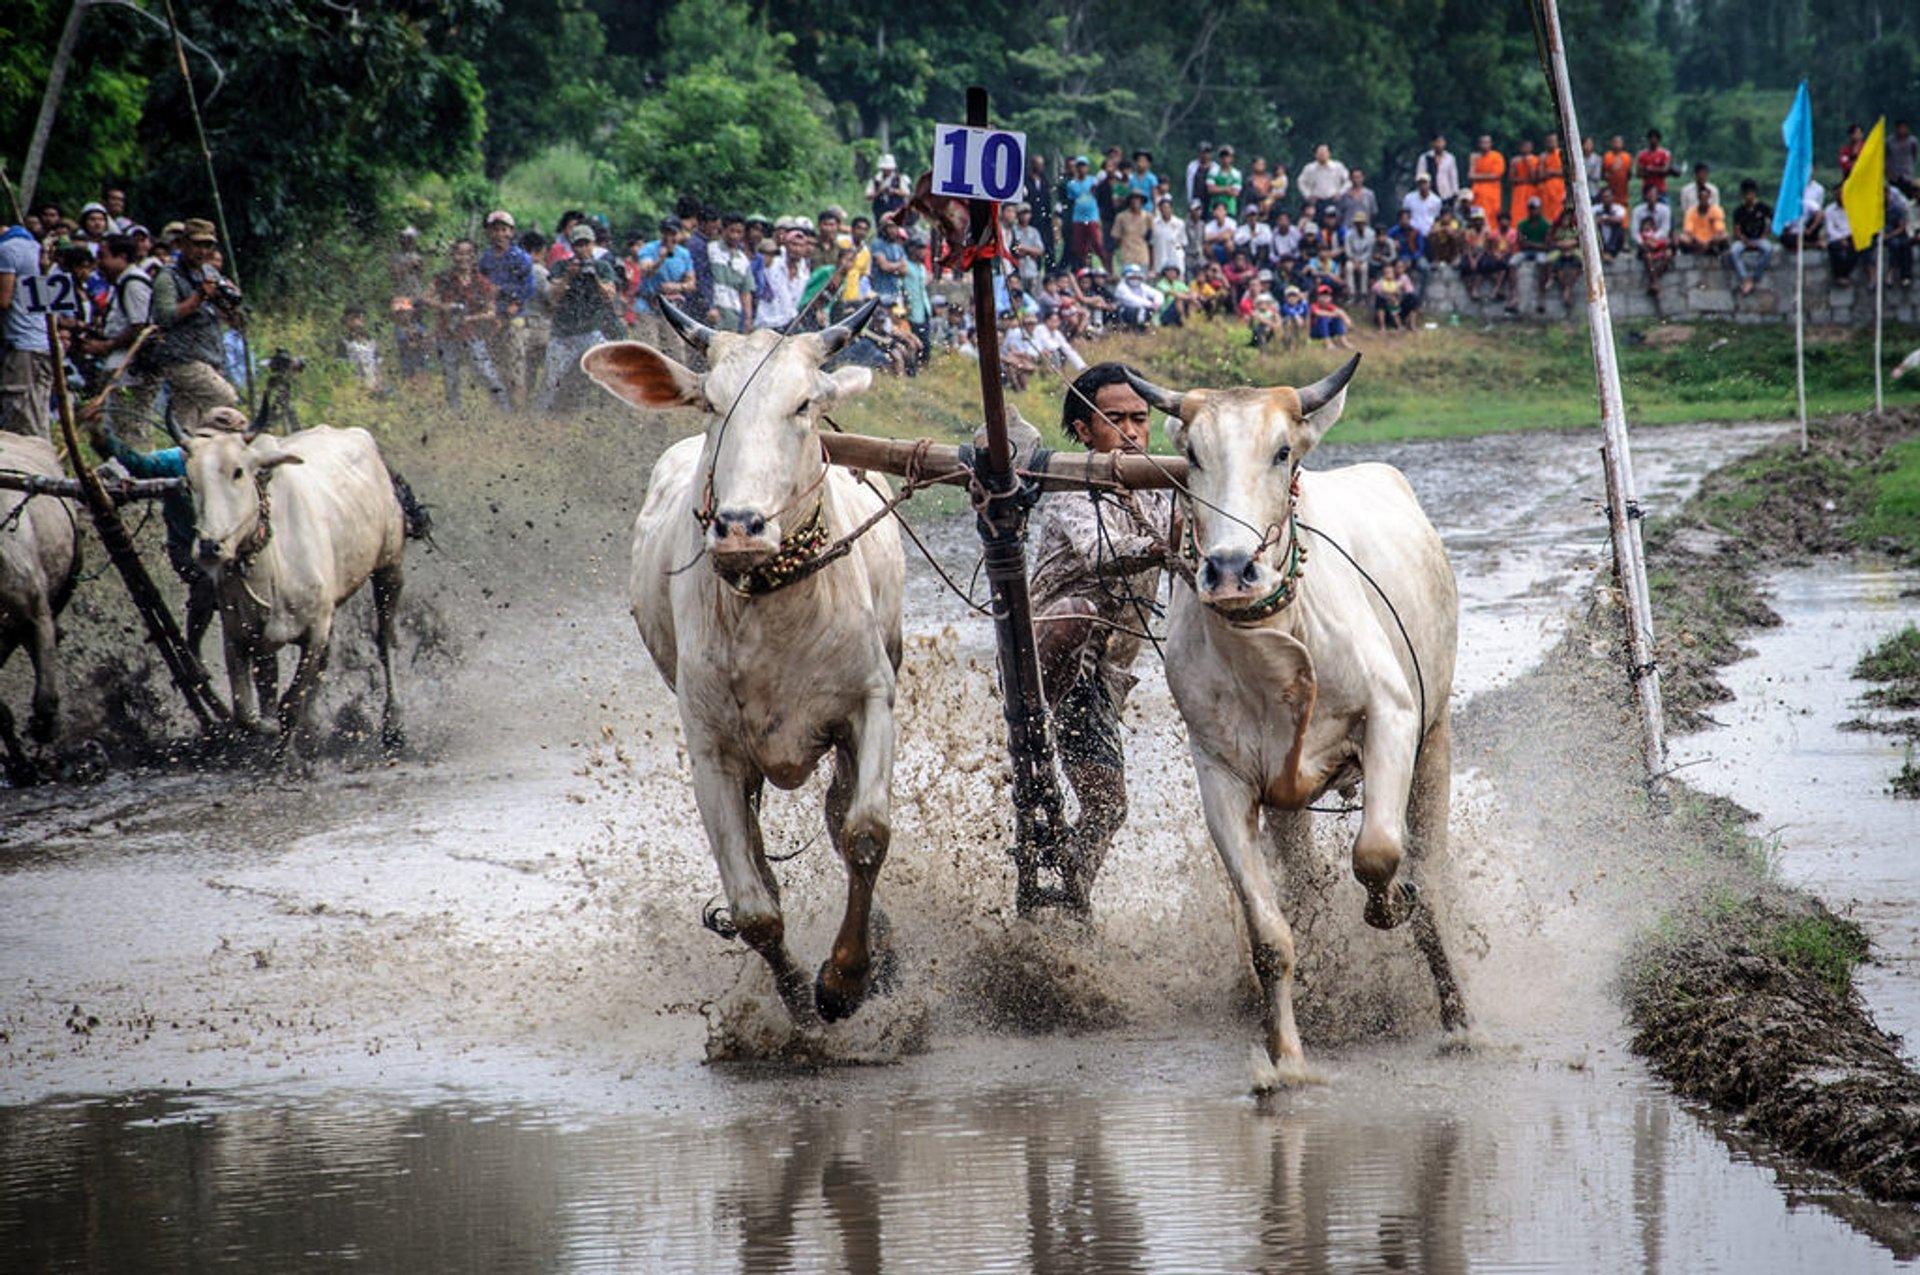 Cow Racing Festival in Vietnam 2020 - Best Time